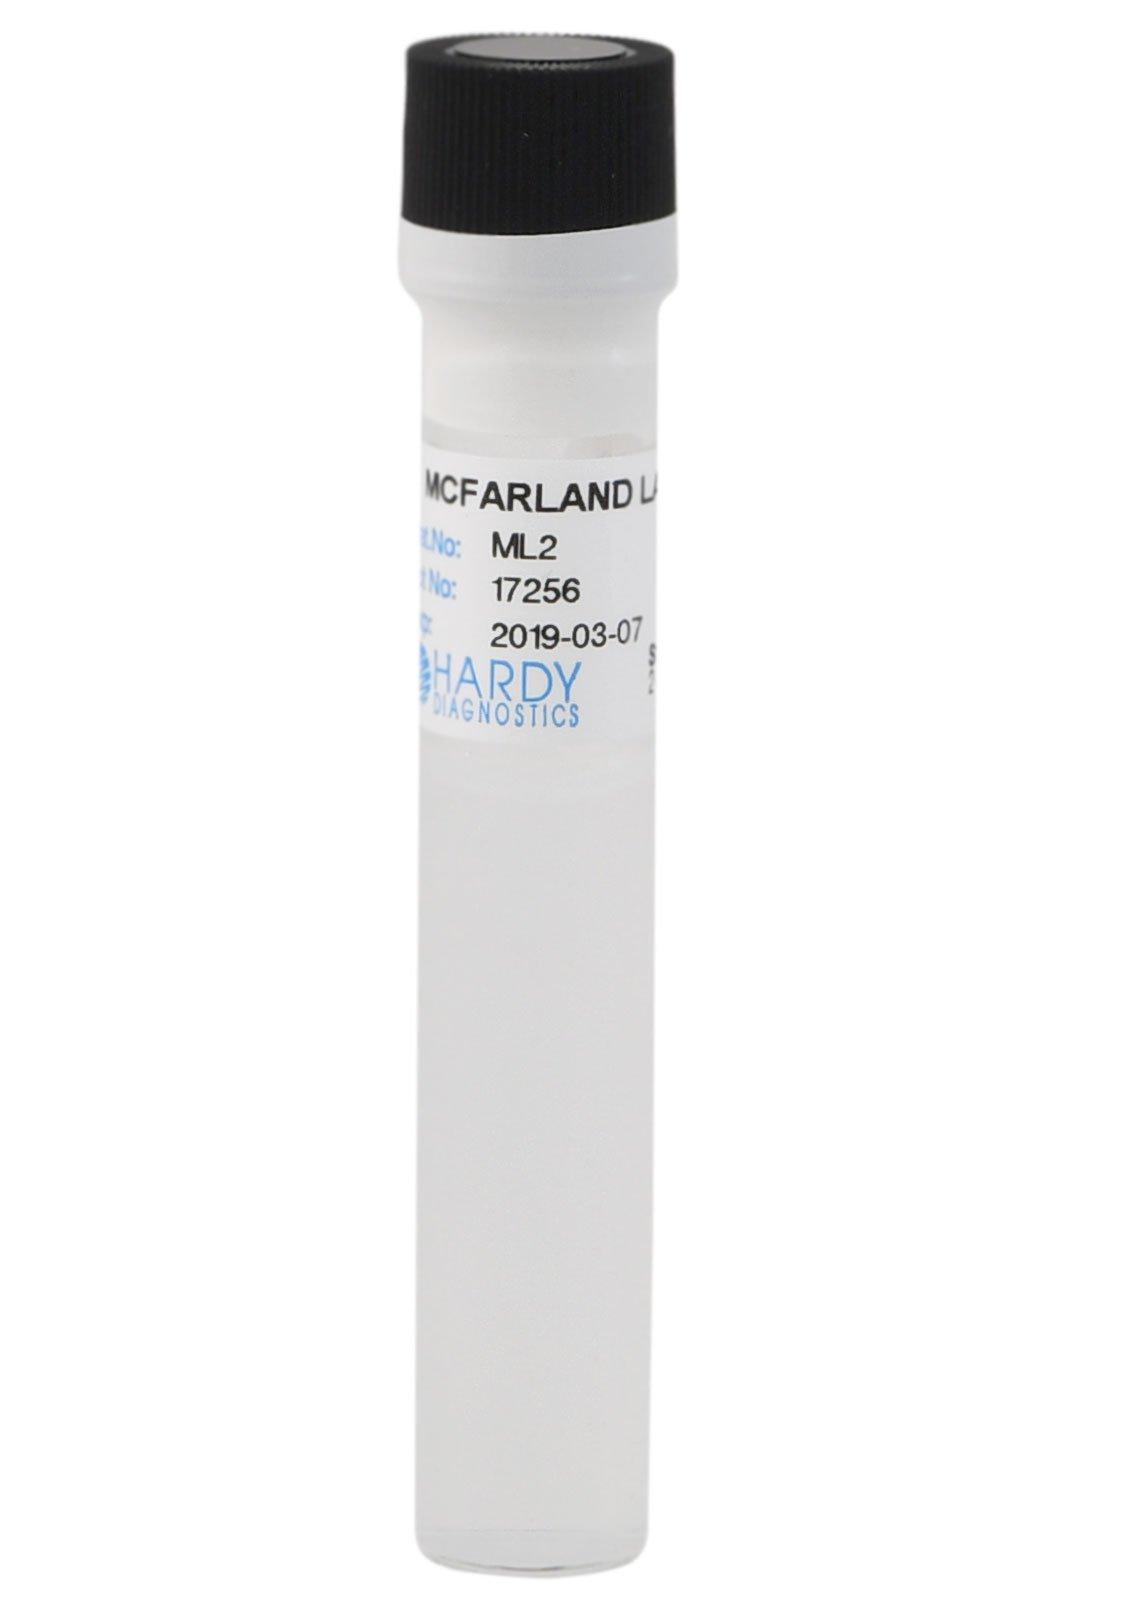 McFarland Standard, Latex Equivalent # 2, 8 Milliliter Fill, 16x100mm Tube, by Hardy Diagnostics